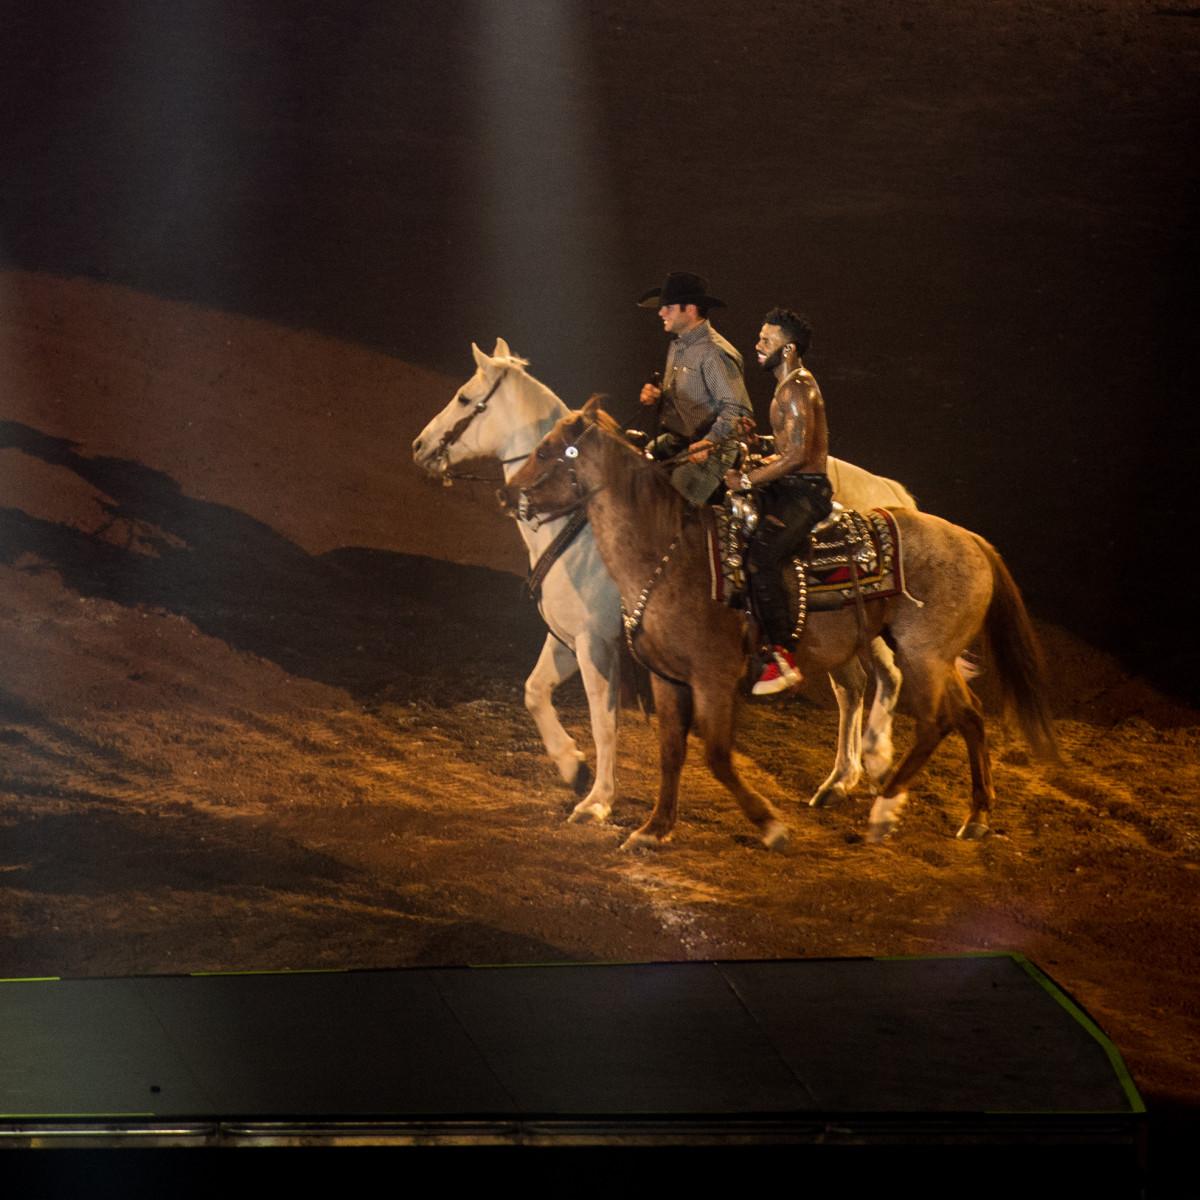 Jason Derulo at Houston Rodeo